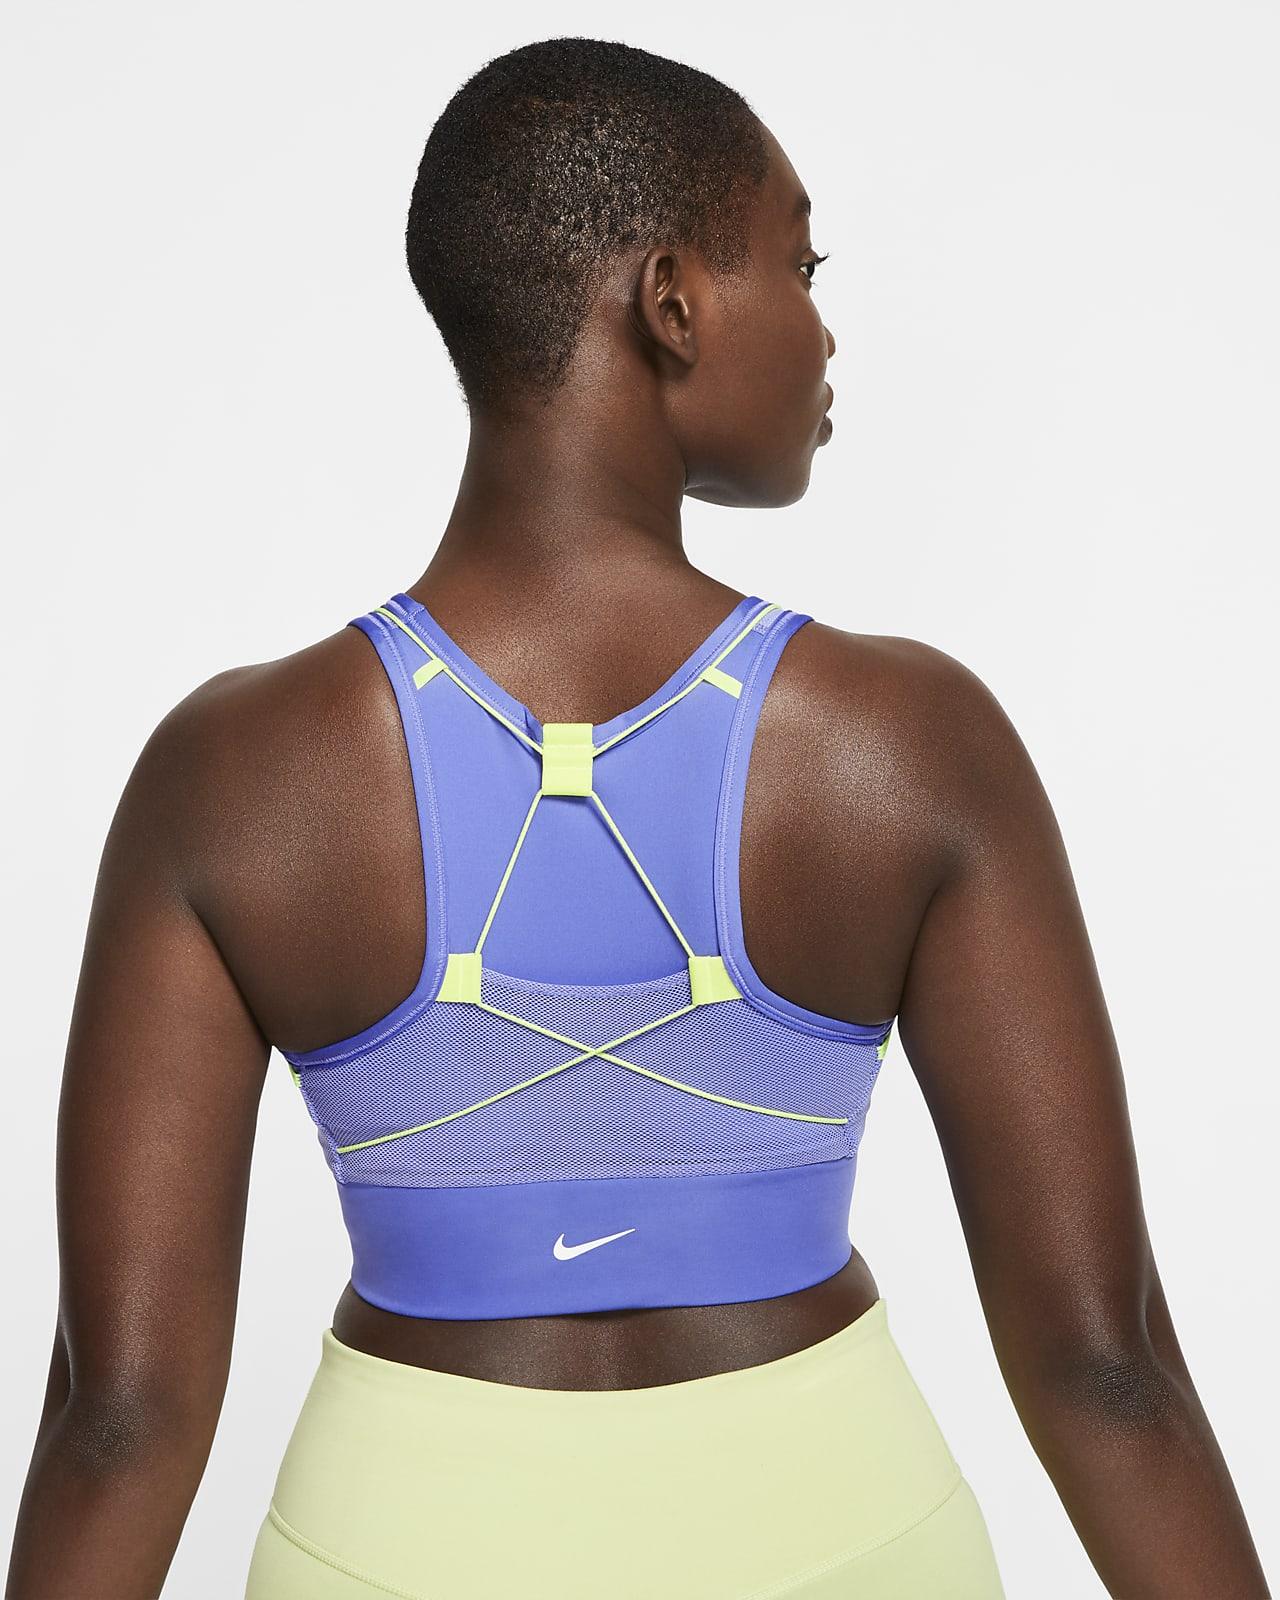 Спортивное бра со средней поддержкой с карманами Nike Swoosh Icon Clash